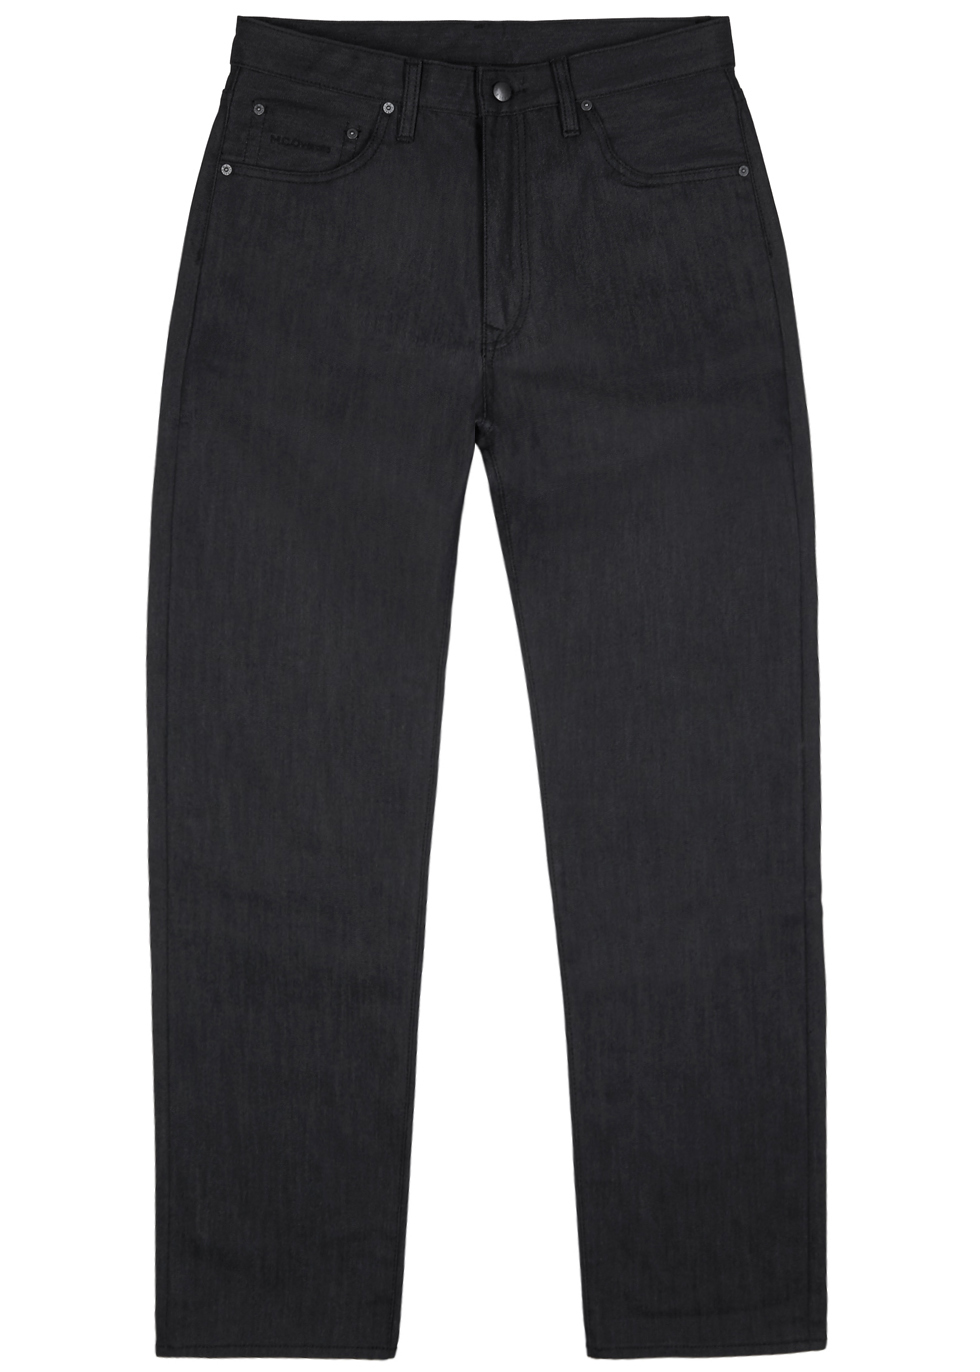 M.C. OVERALLS Reflective Straight-Leg Jeans in Dark Grey